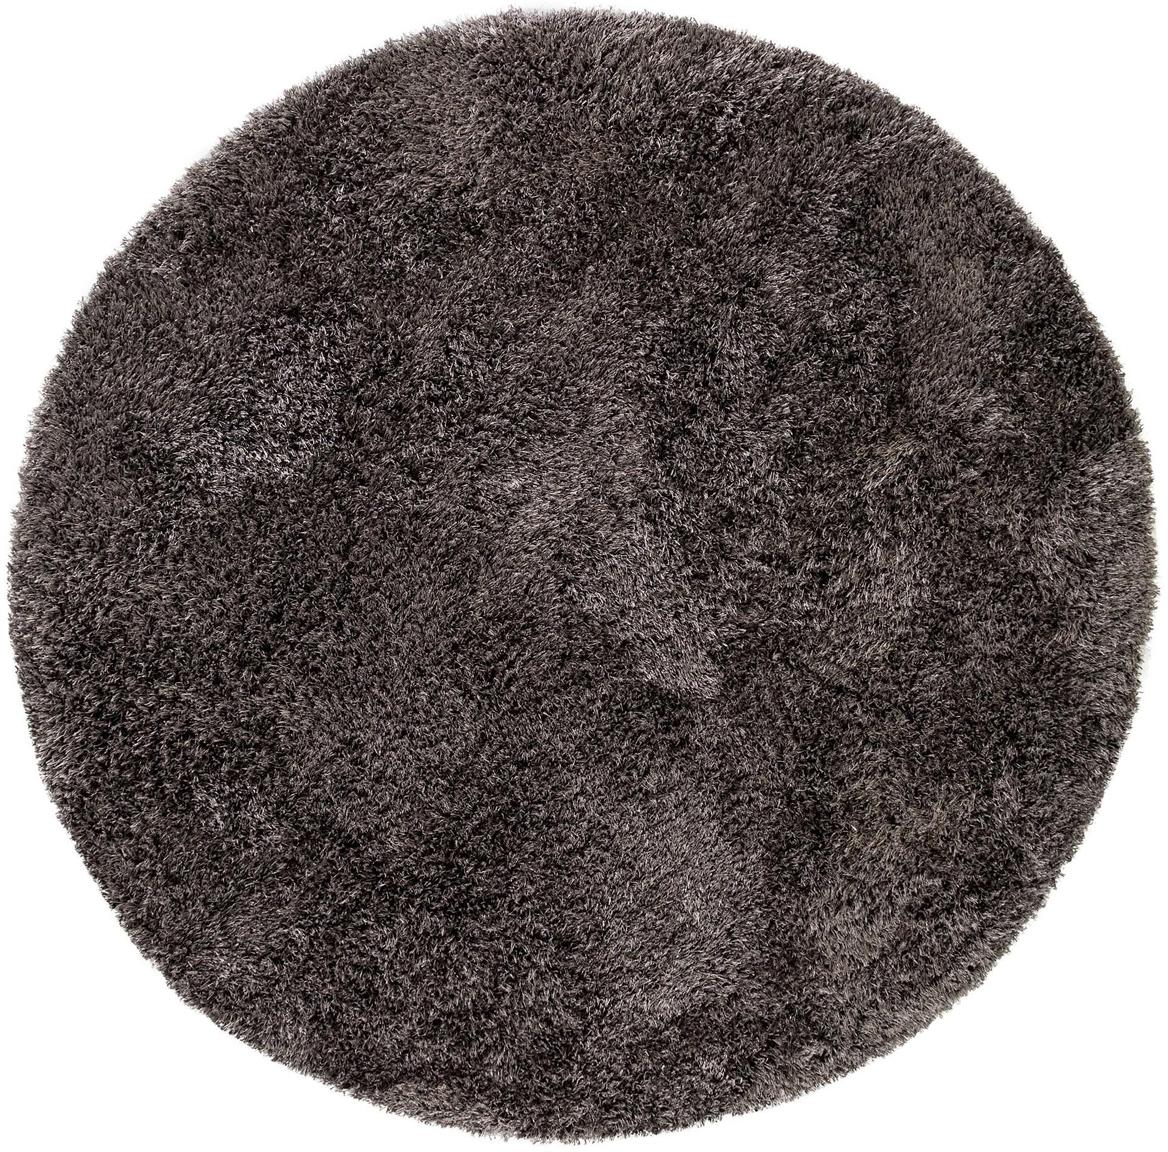 Alfombra redonda de pelo largo Lea, 50%poliéster, 50%polipropileno, Gris antracita, Ø 160 cm (Tamaño M)